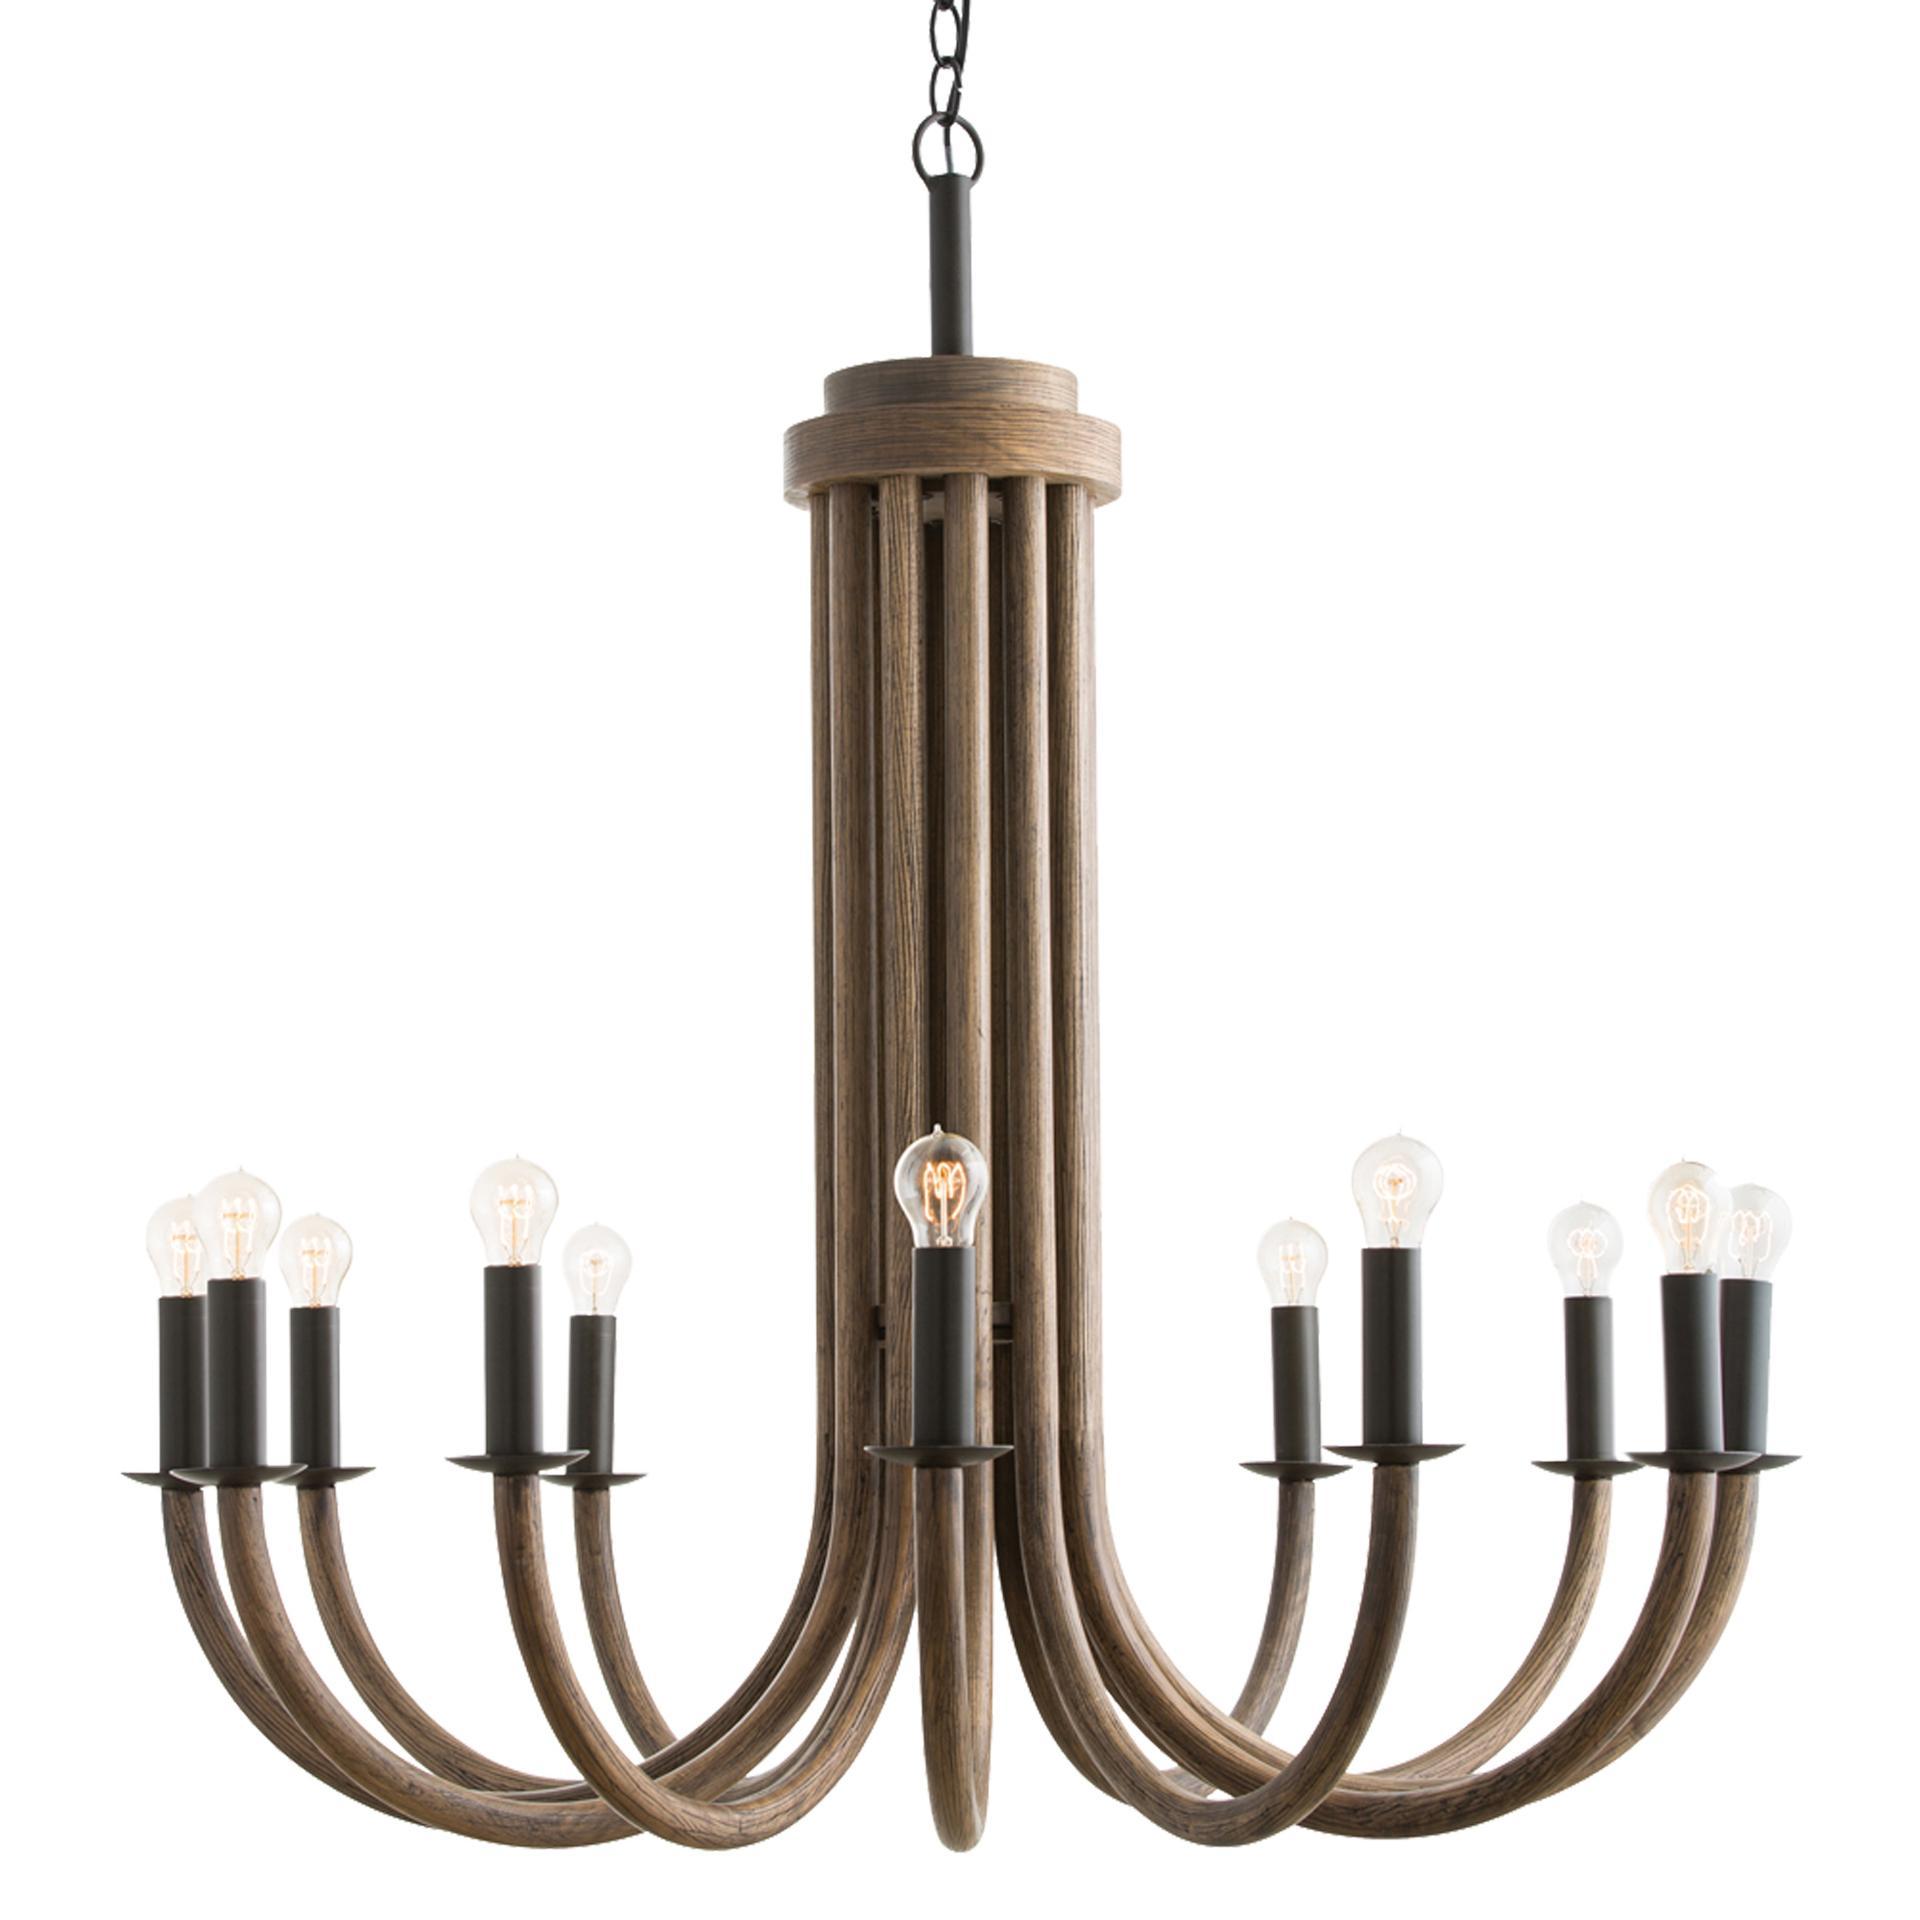 Rustic Outdoor Chandelier Decor Ideasdecor Ideas